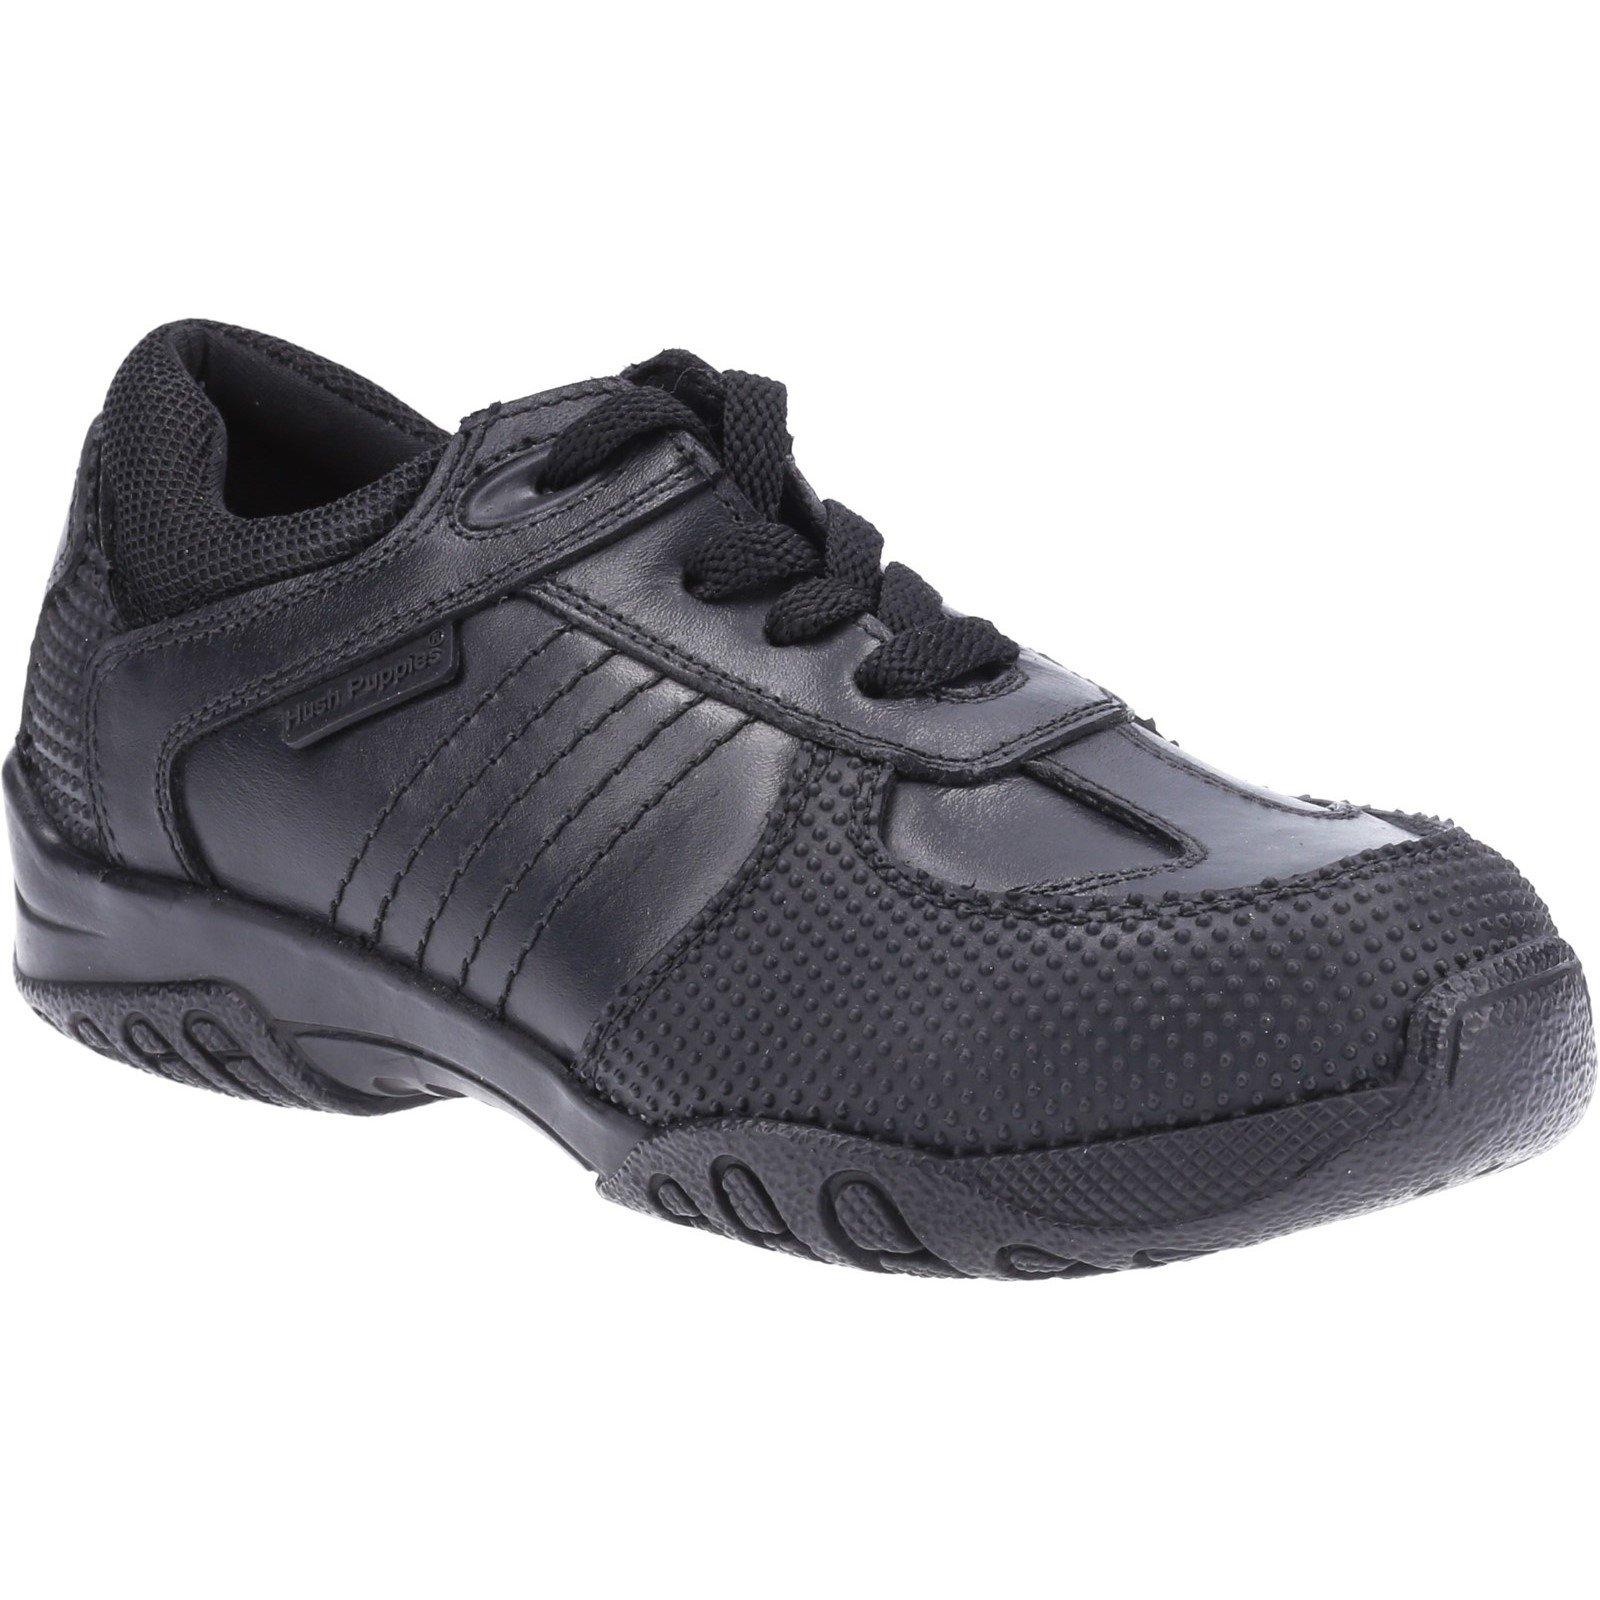 Hush Puppies Kid's Jezza Junior School Shoe Black 32587 - Black 13.5